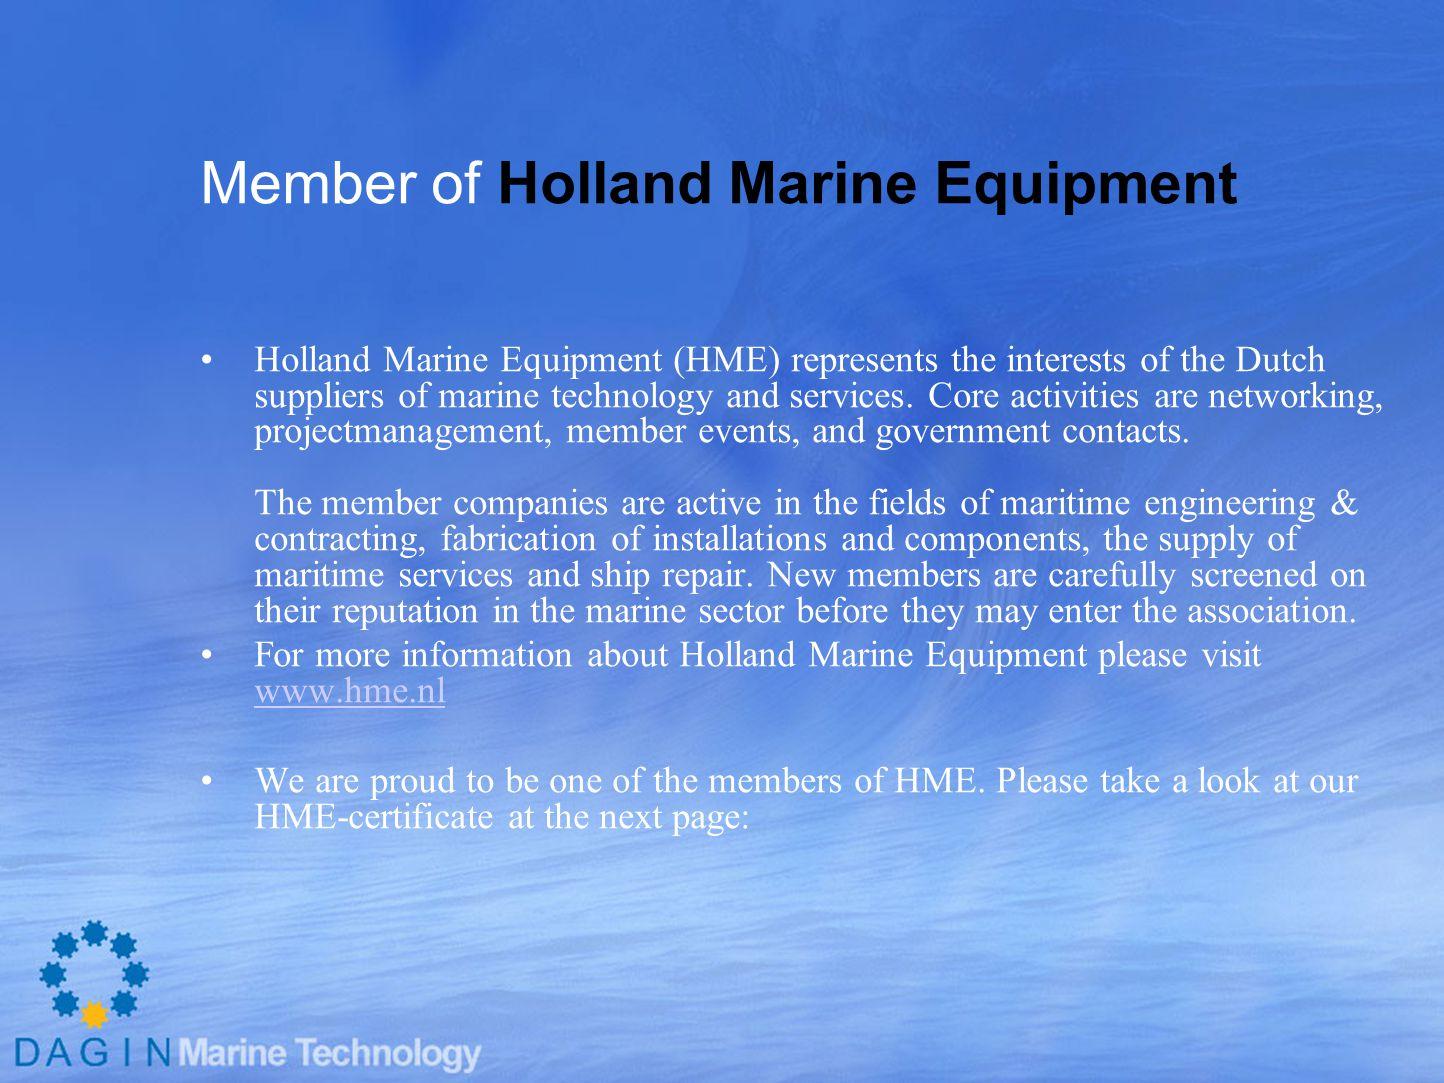 Member of Holland Marine Equipment